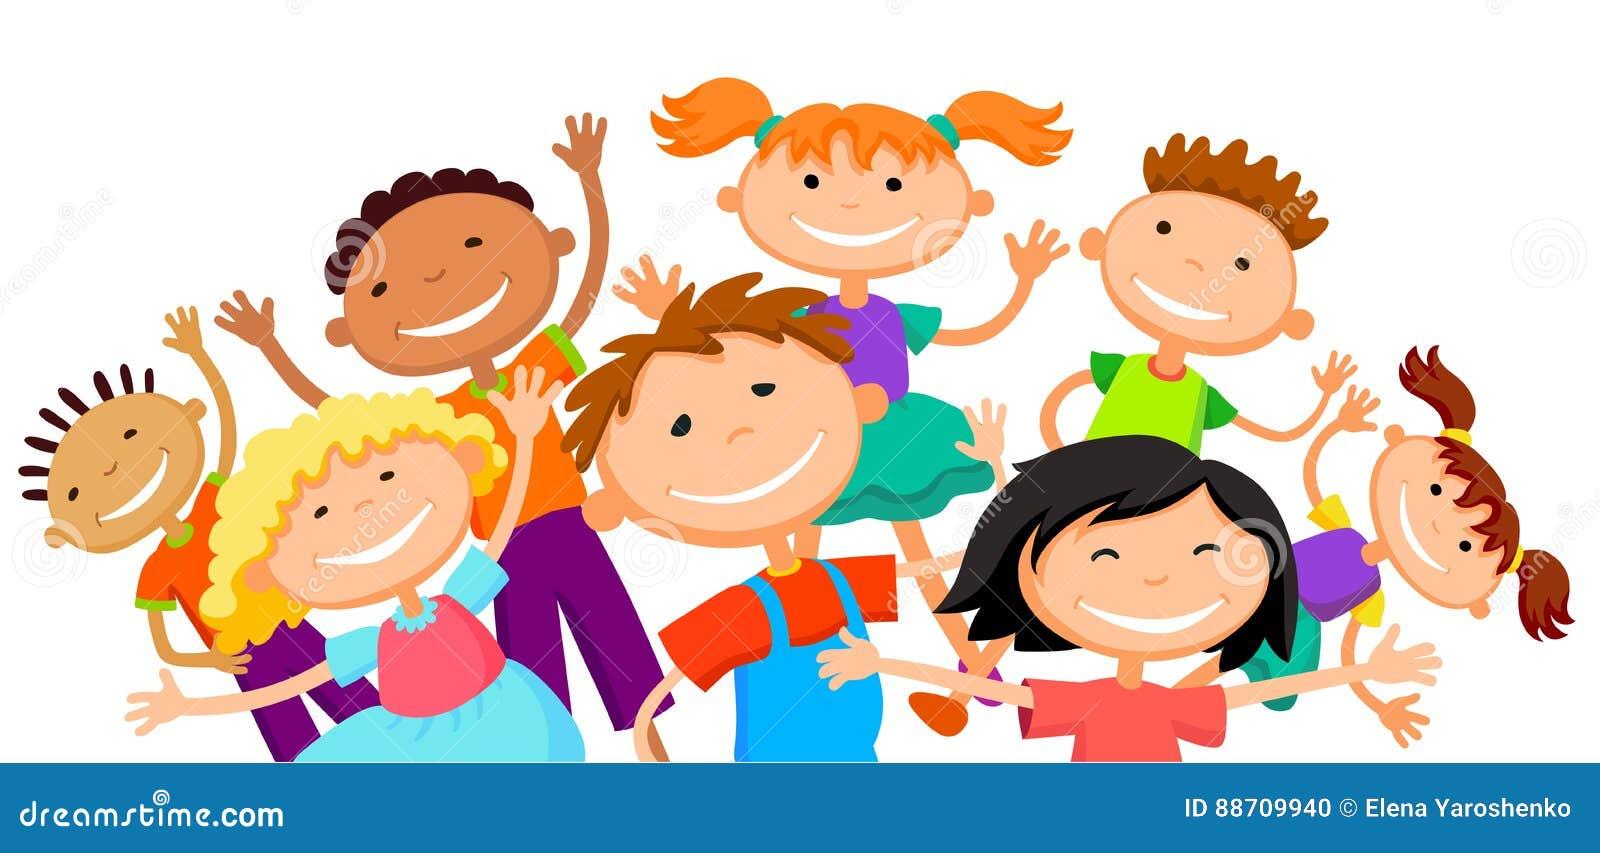 Group of children kids are jumping joyful white background bunner cartoon funny vector character. illustration